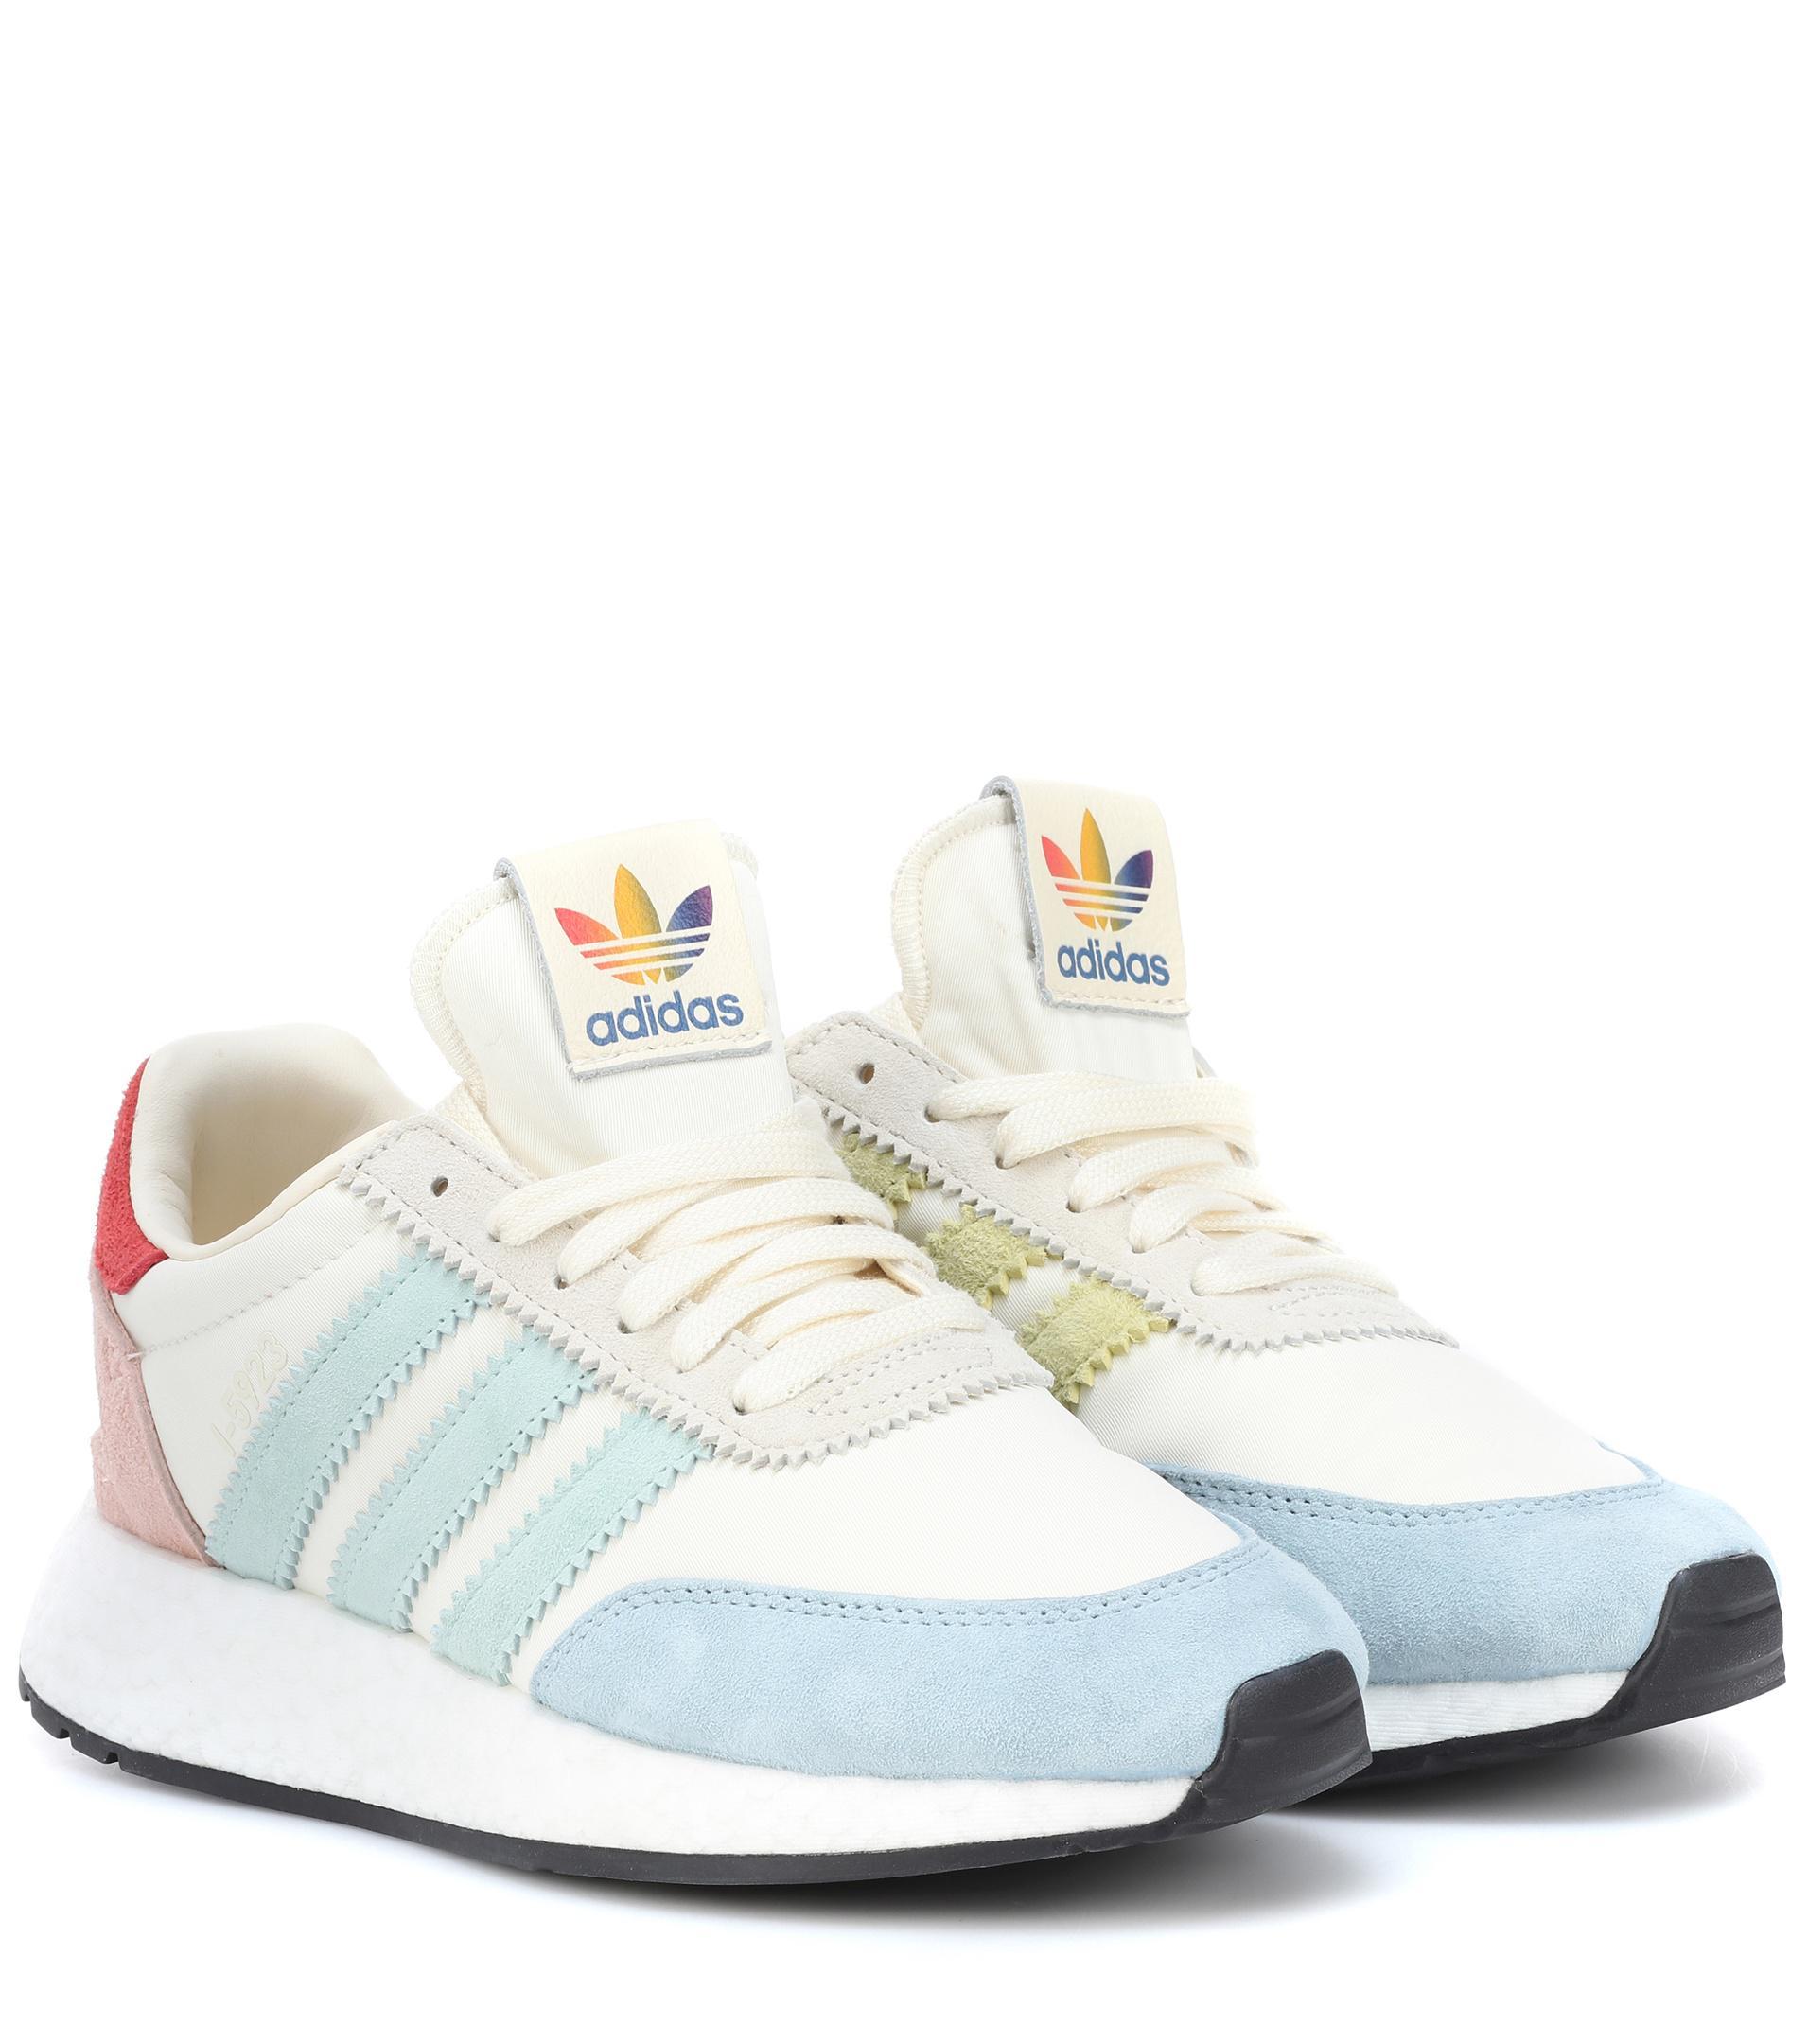 huge selection of 43848 31d54 adidas Originals I-5923 Runner Pride Sneakers in White - Lys